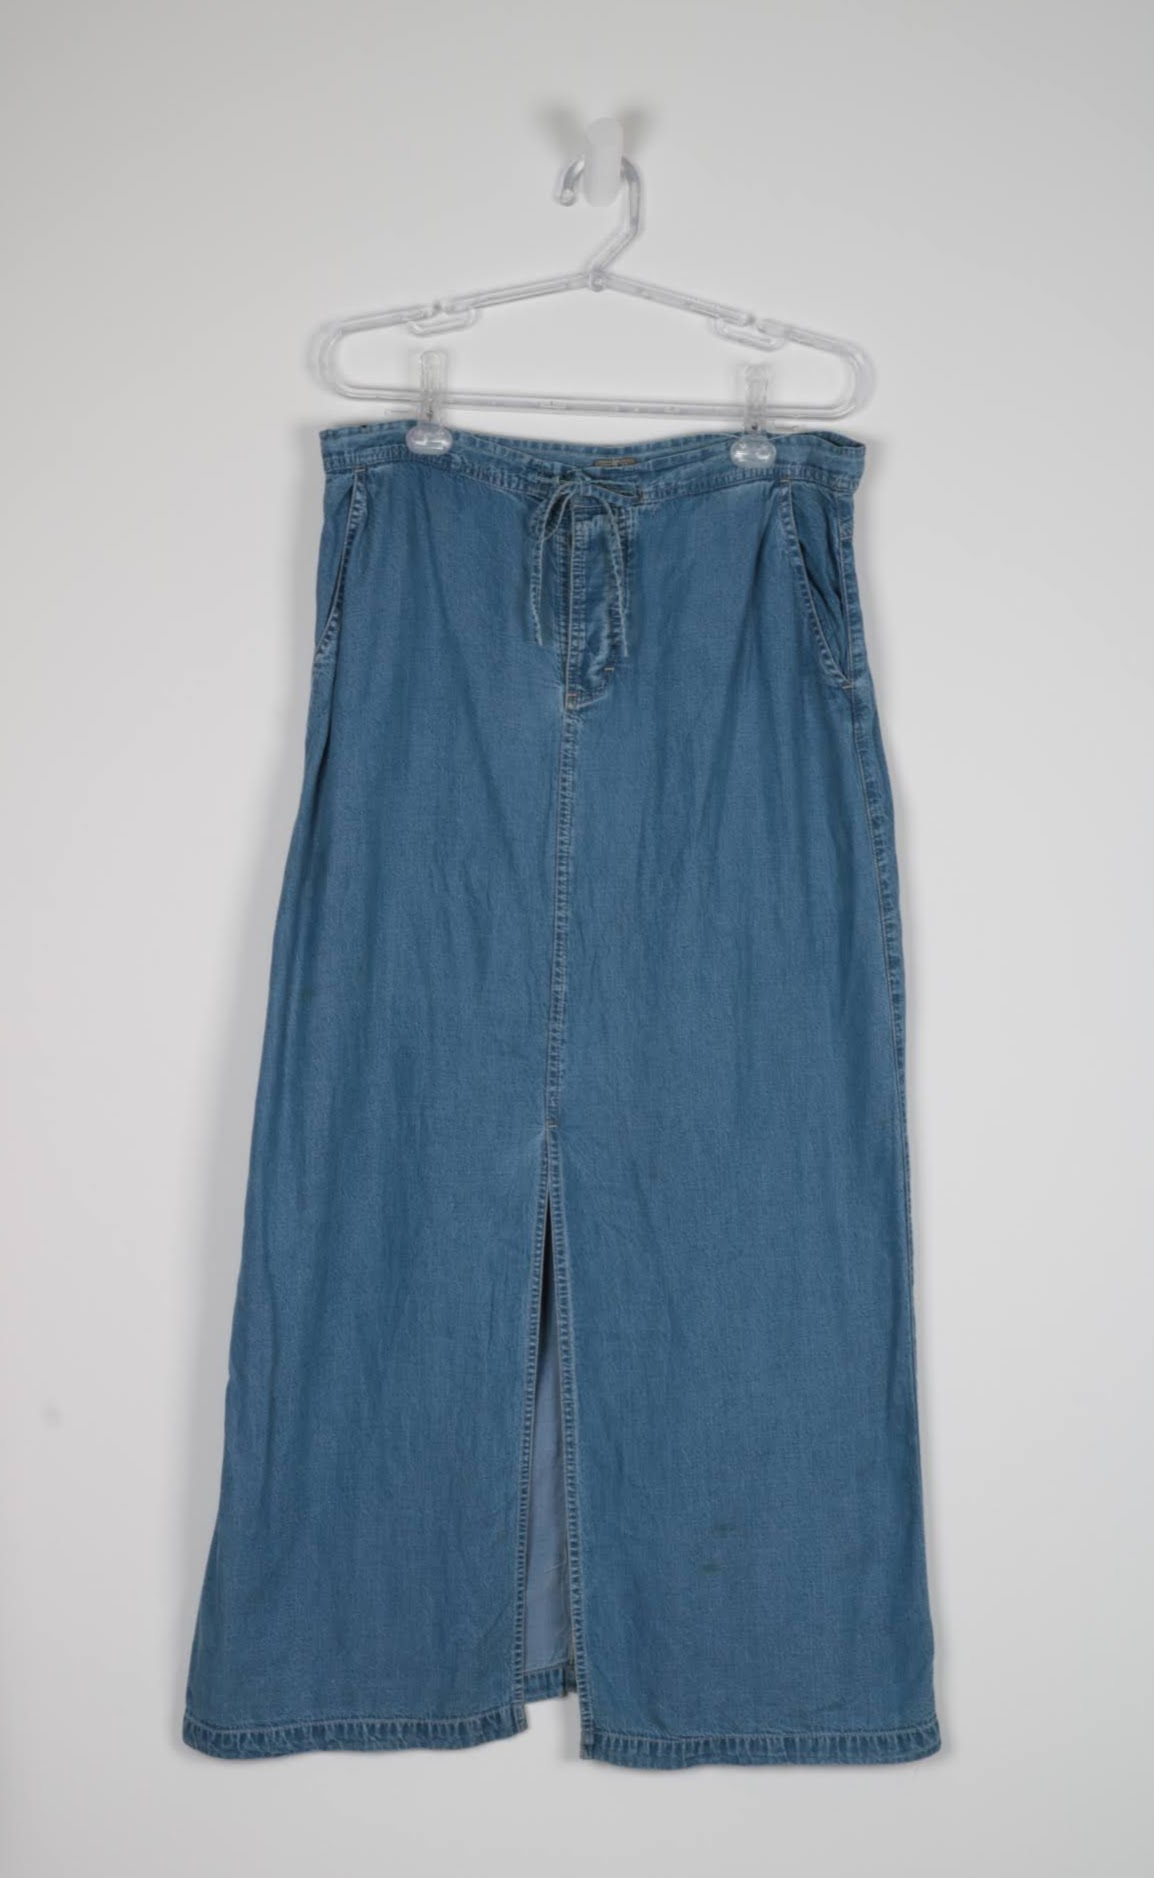 Saia midi jeans - Sacada - G